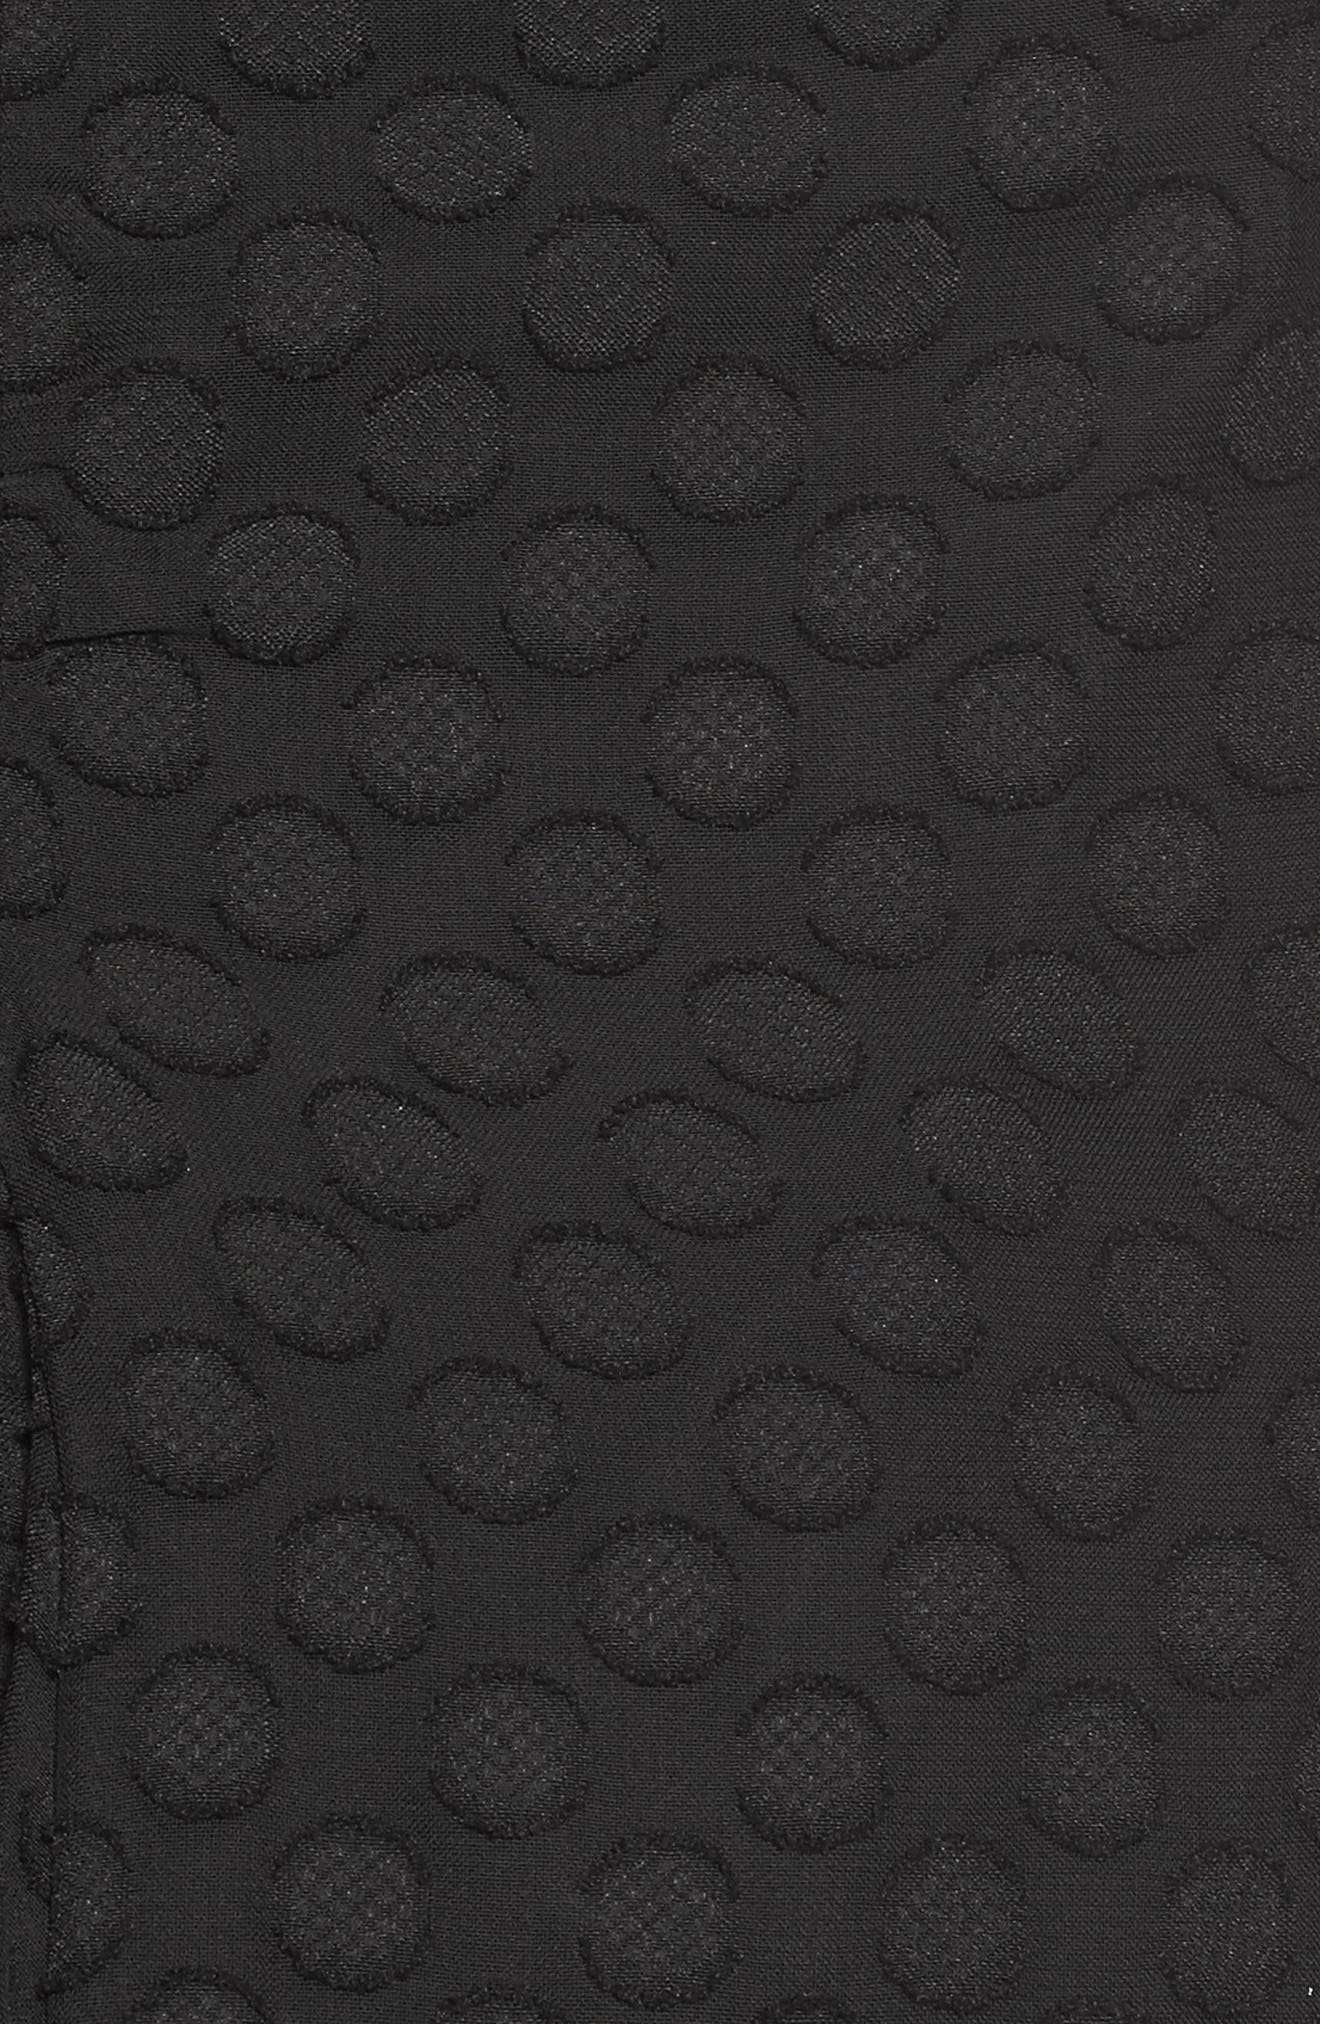 Señorita One-Shoulder Dot Chiffon Dress,                             Alternate thumbnail 5, color,                             001